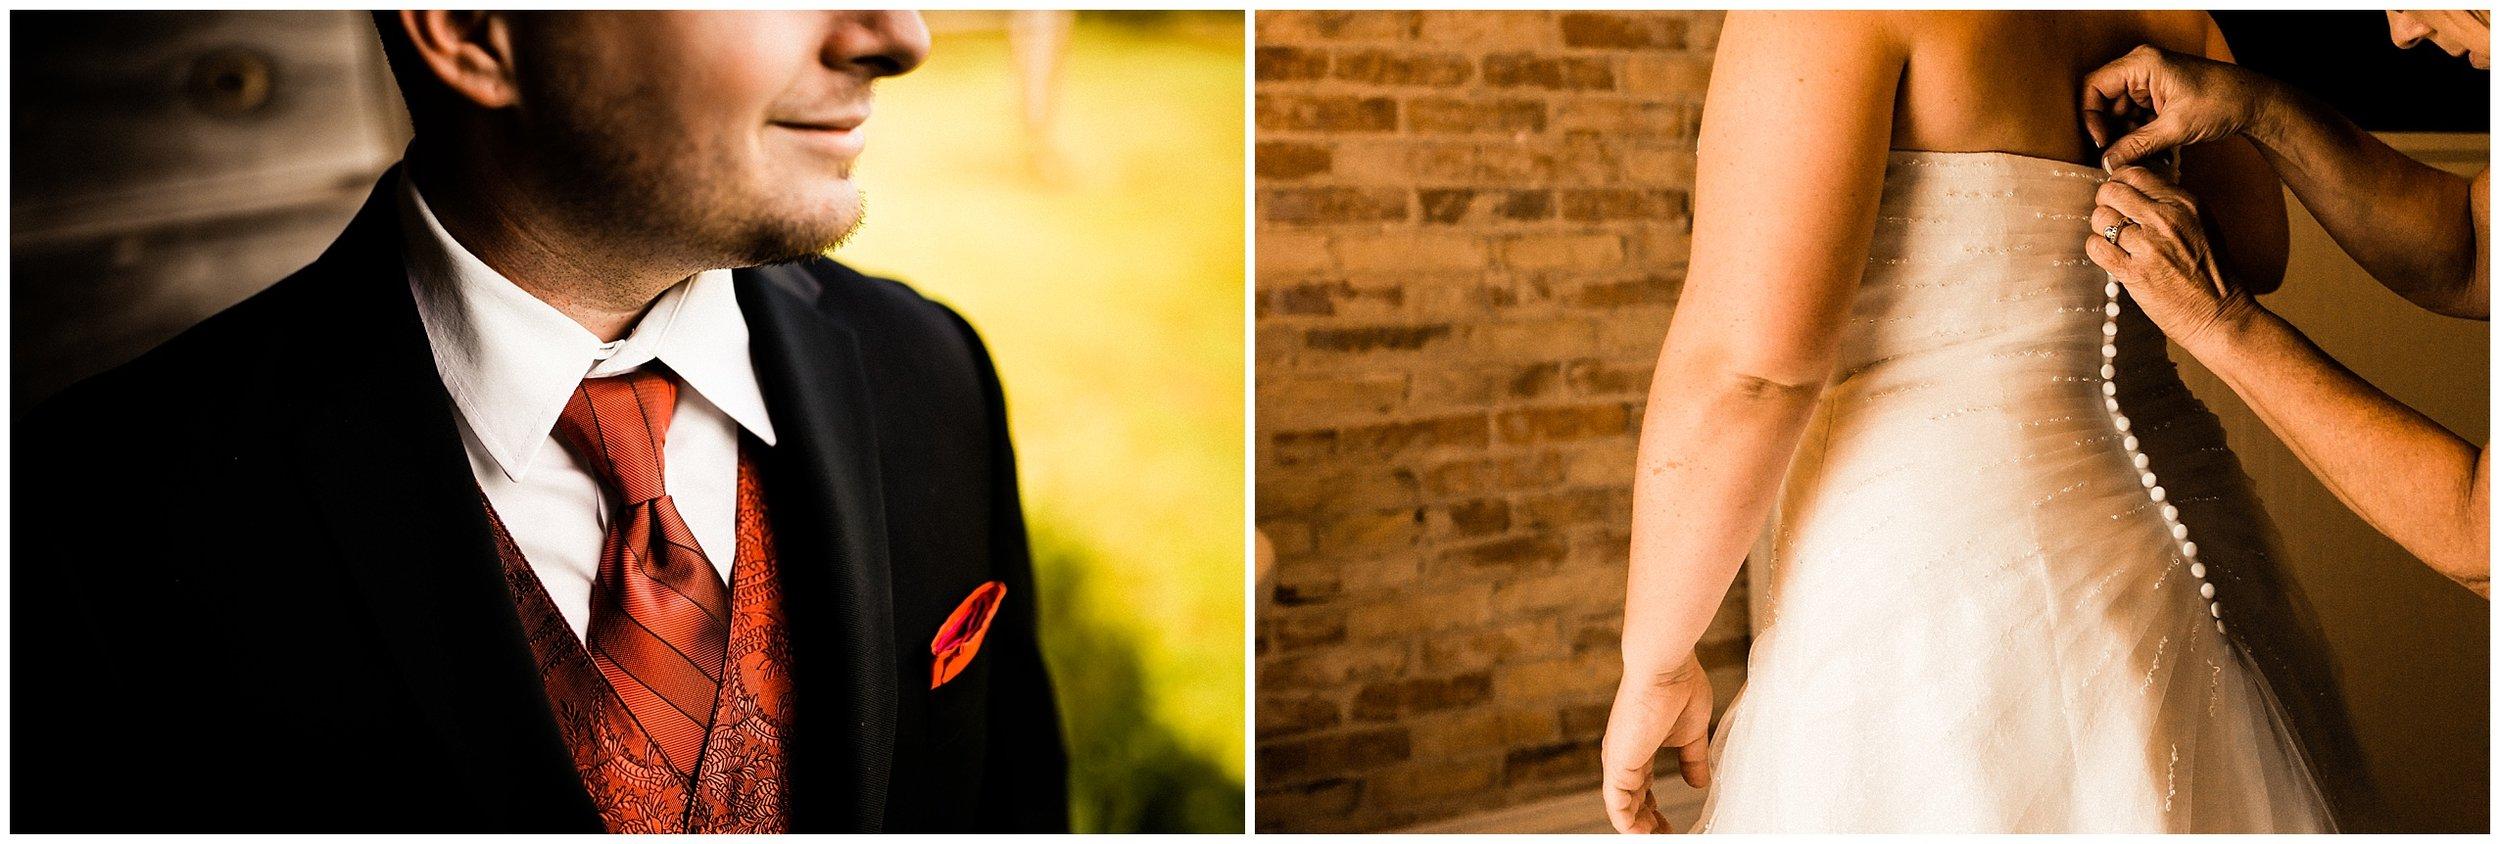 Micheal + Chelsie   Just Married #kyleepaigephotography_1564.jpg